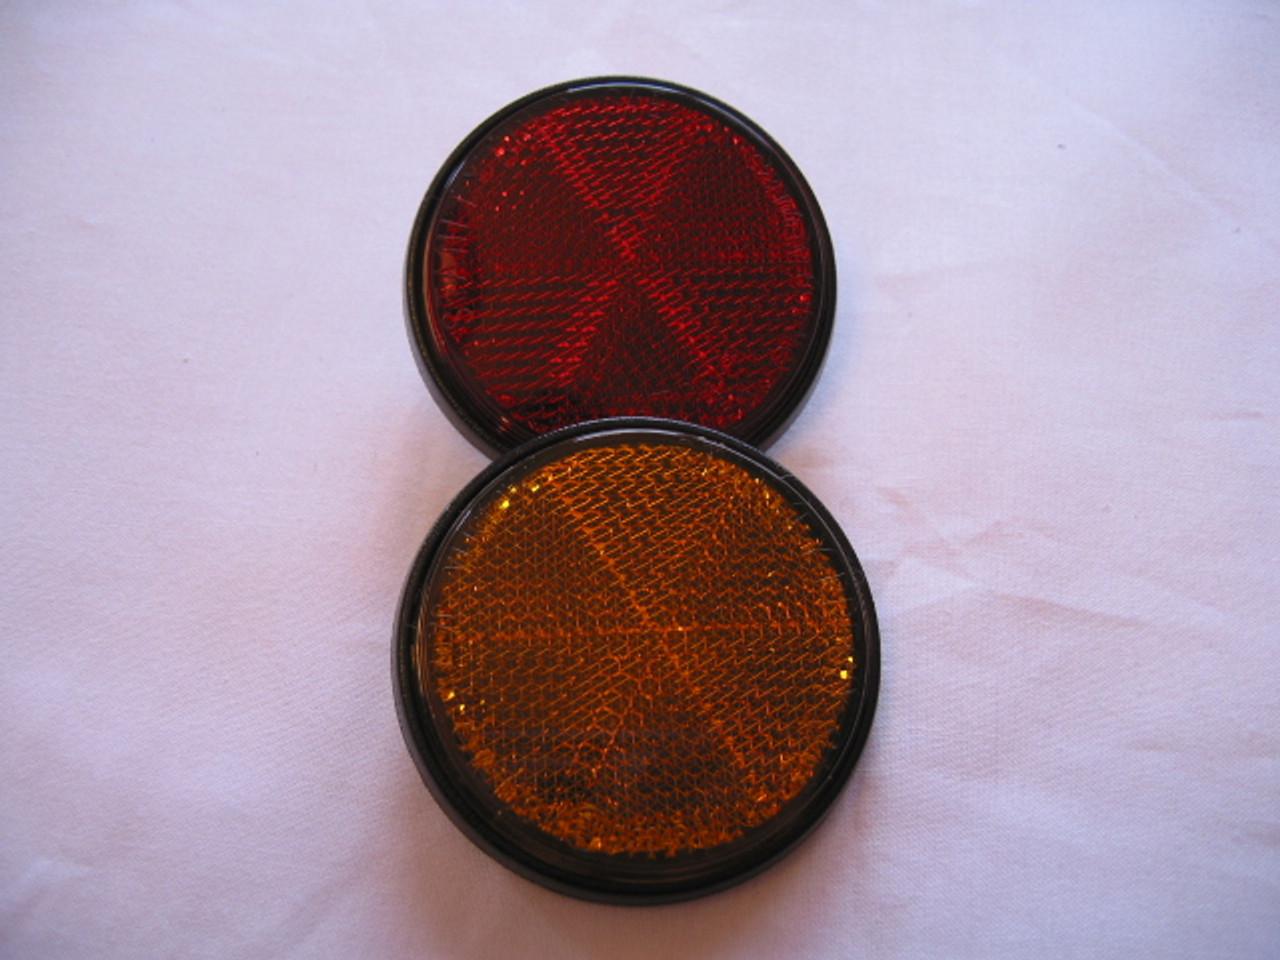 Yamaha Amber Reflector, 355-85111-01-00, HVC20053